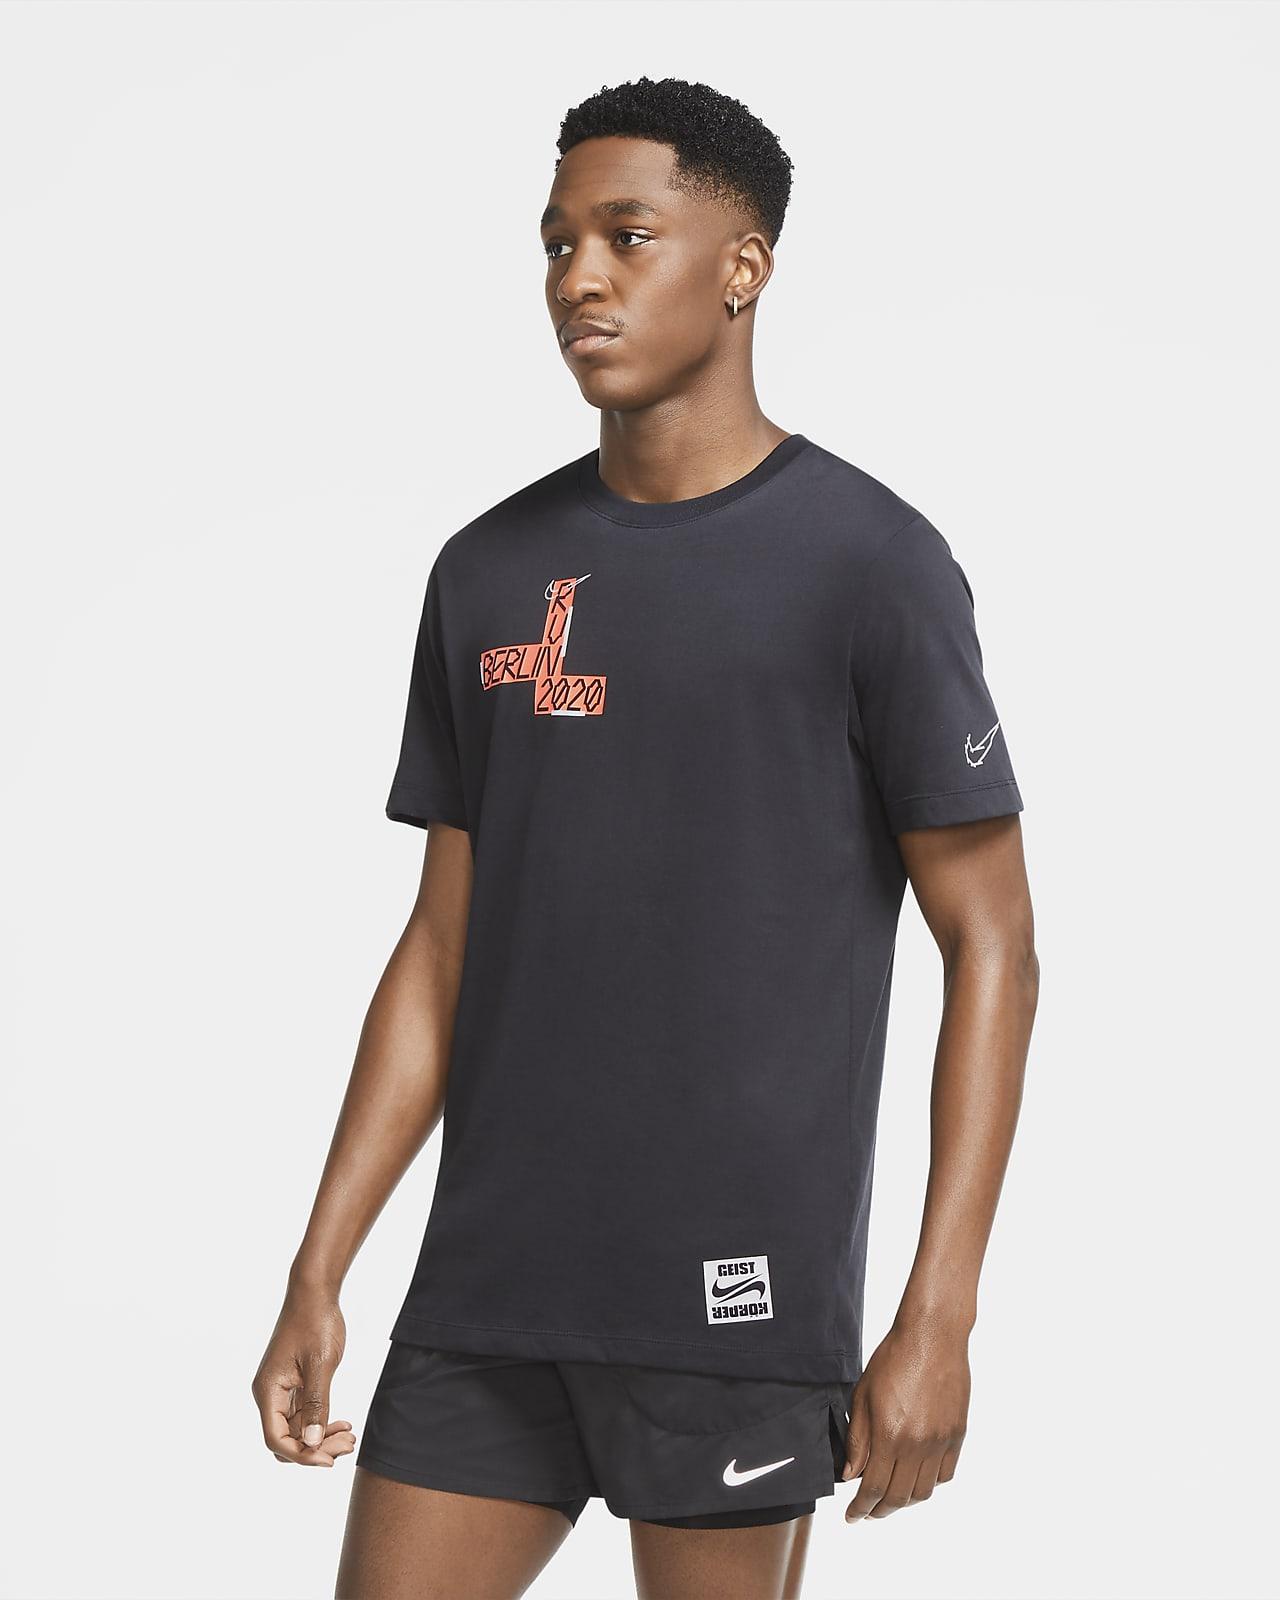 Nike Dri-FIT Berlin Hardloopshirt voor heren